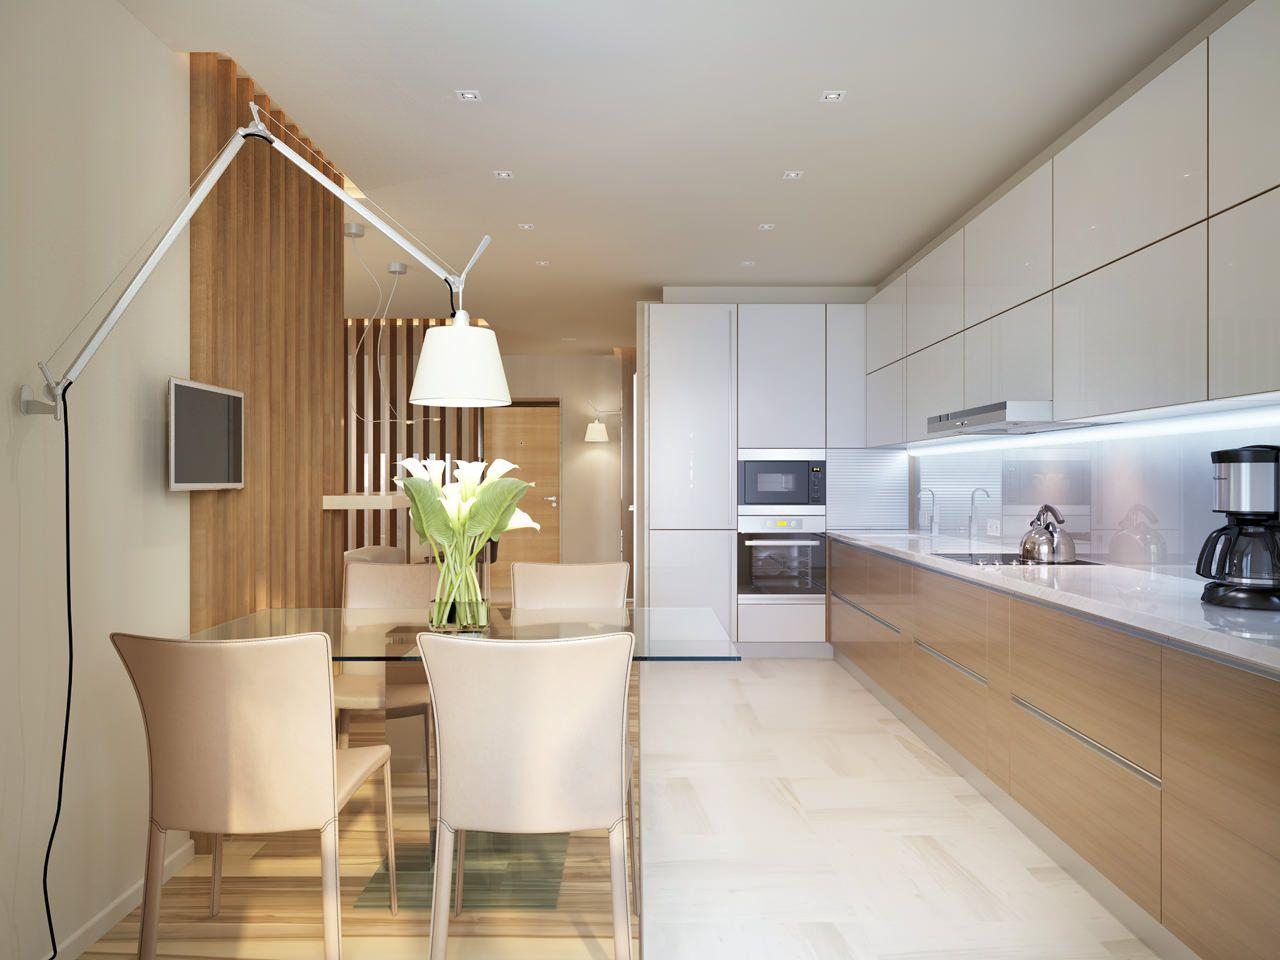 Decoraci n de interiores modernos ideas para renovar tu - Muebles blancos ...